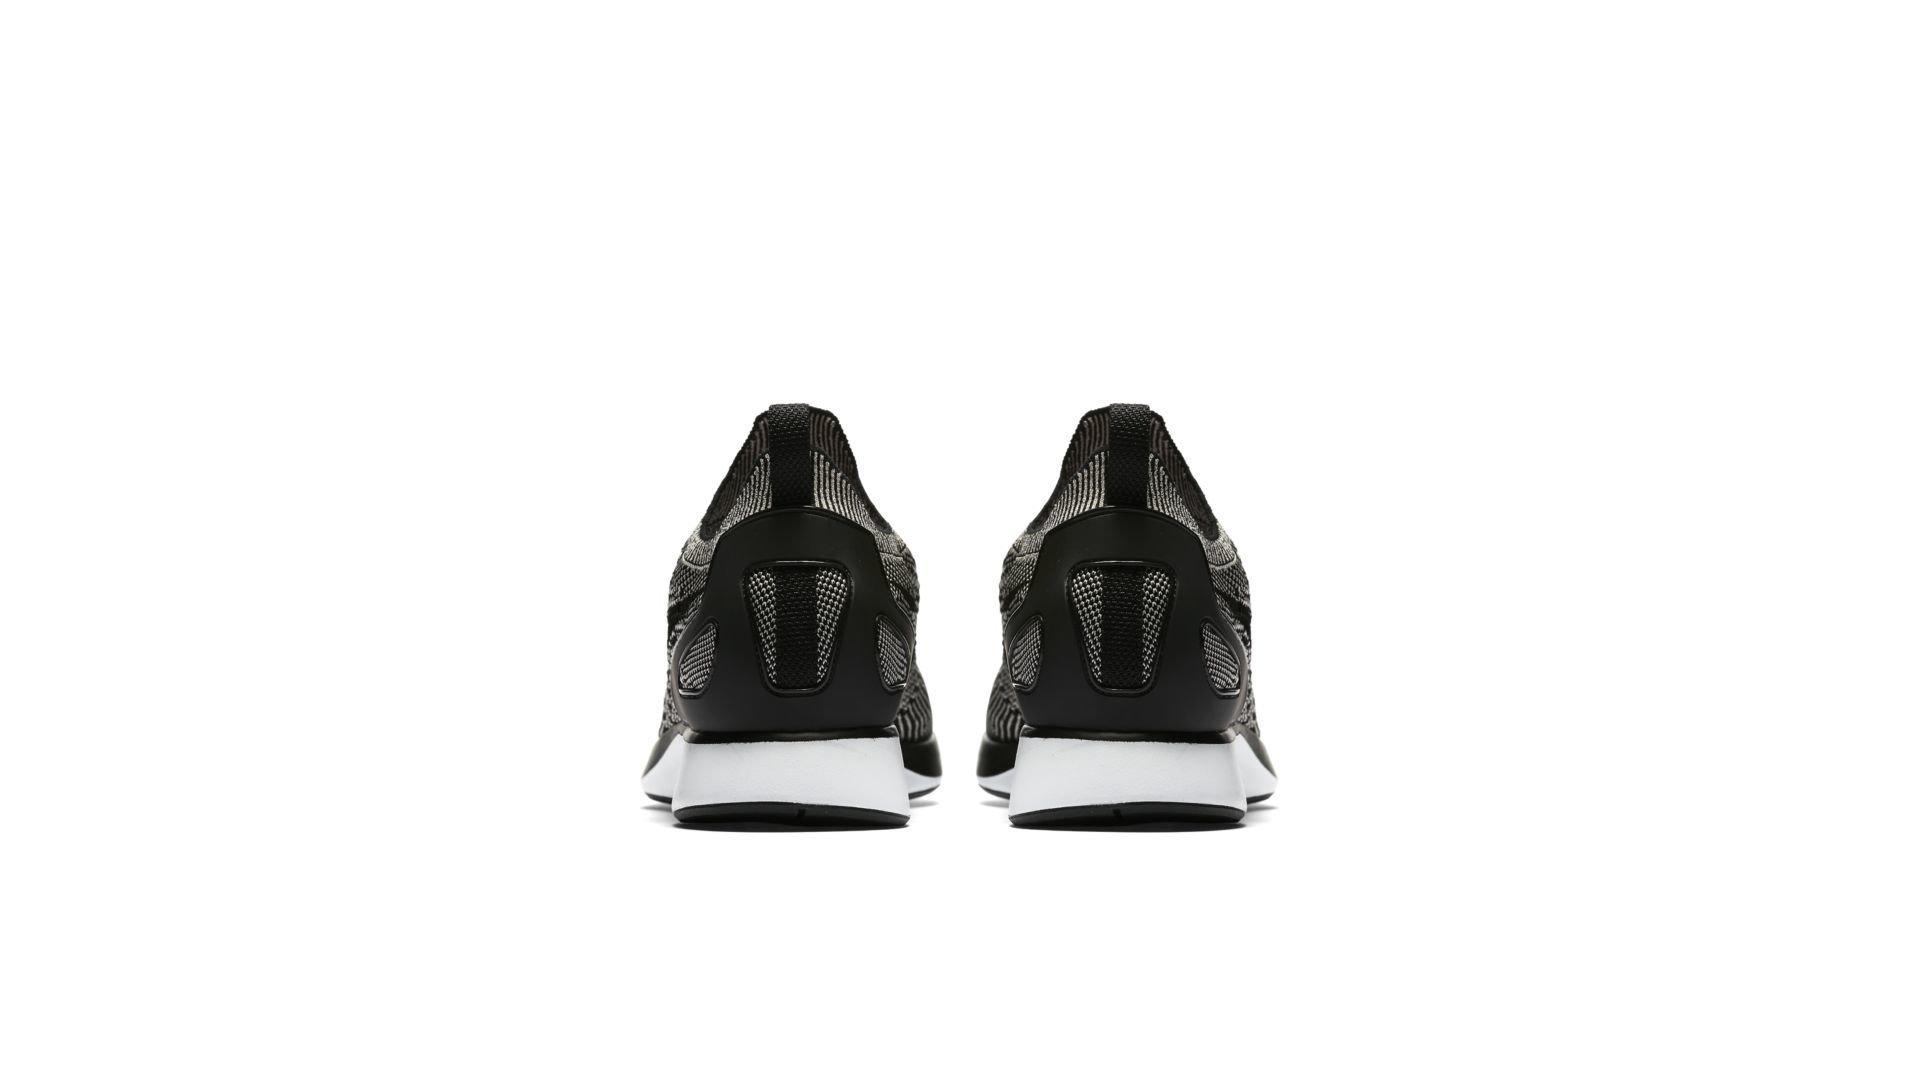 Nike Mariah Flyknit Racer Pale Grey Solar Red (918264-003)